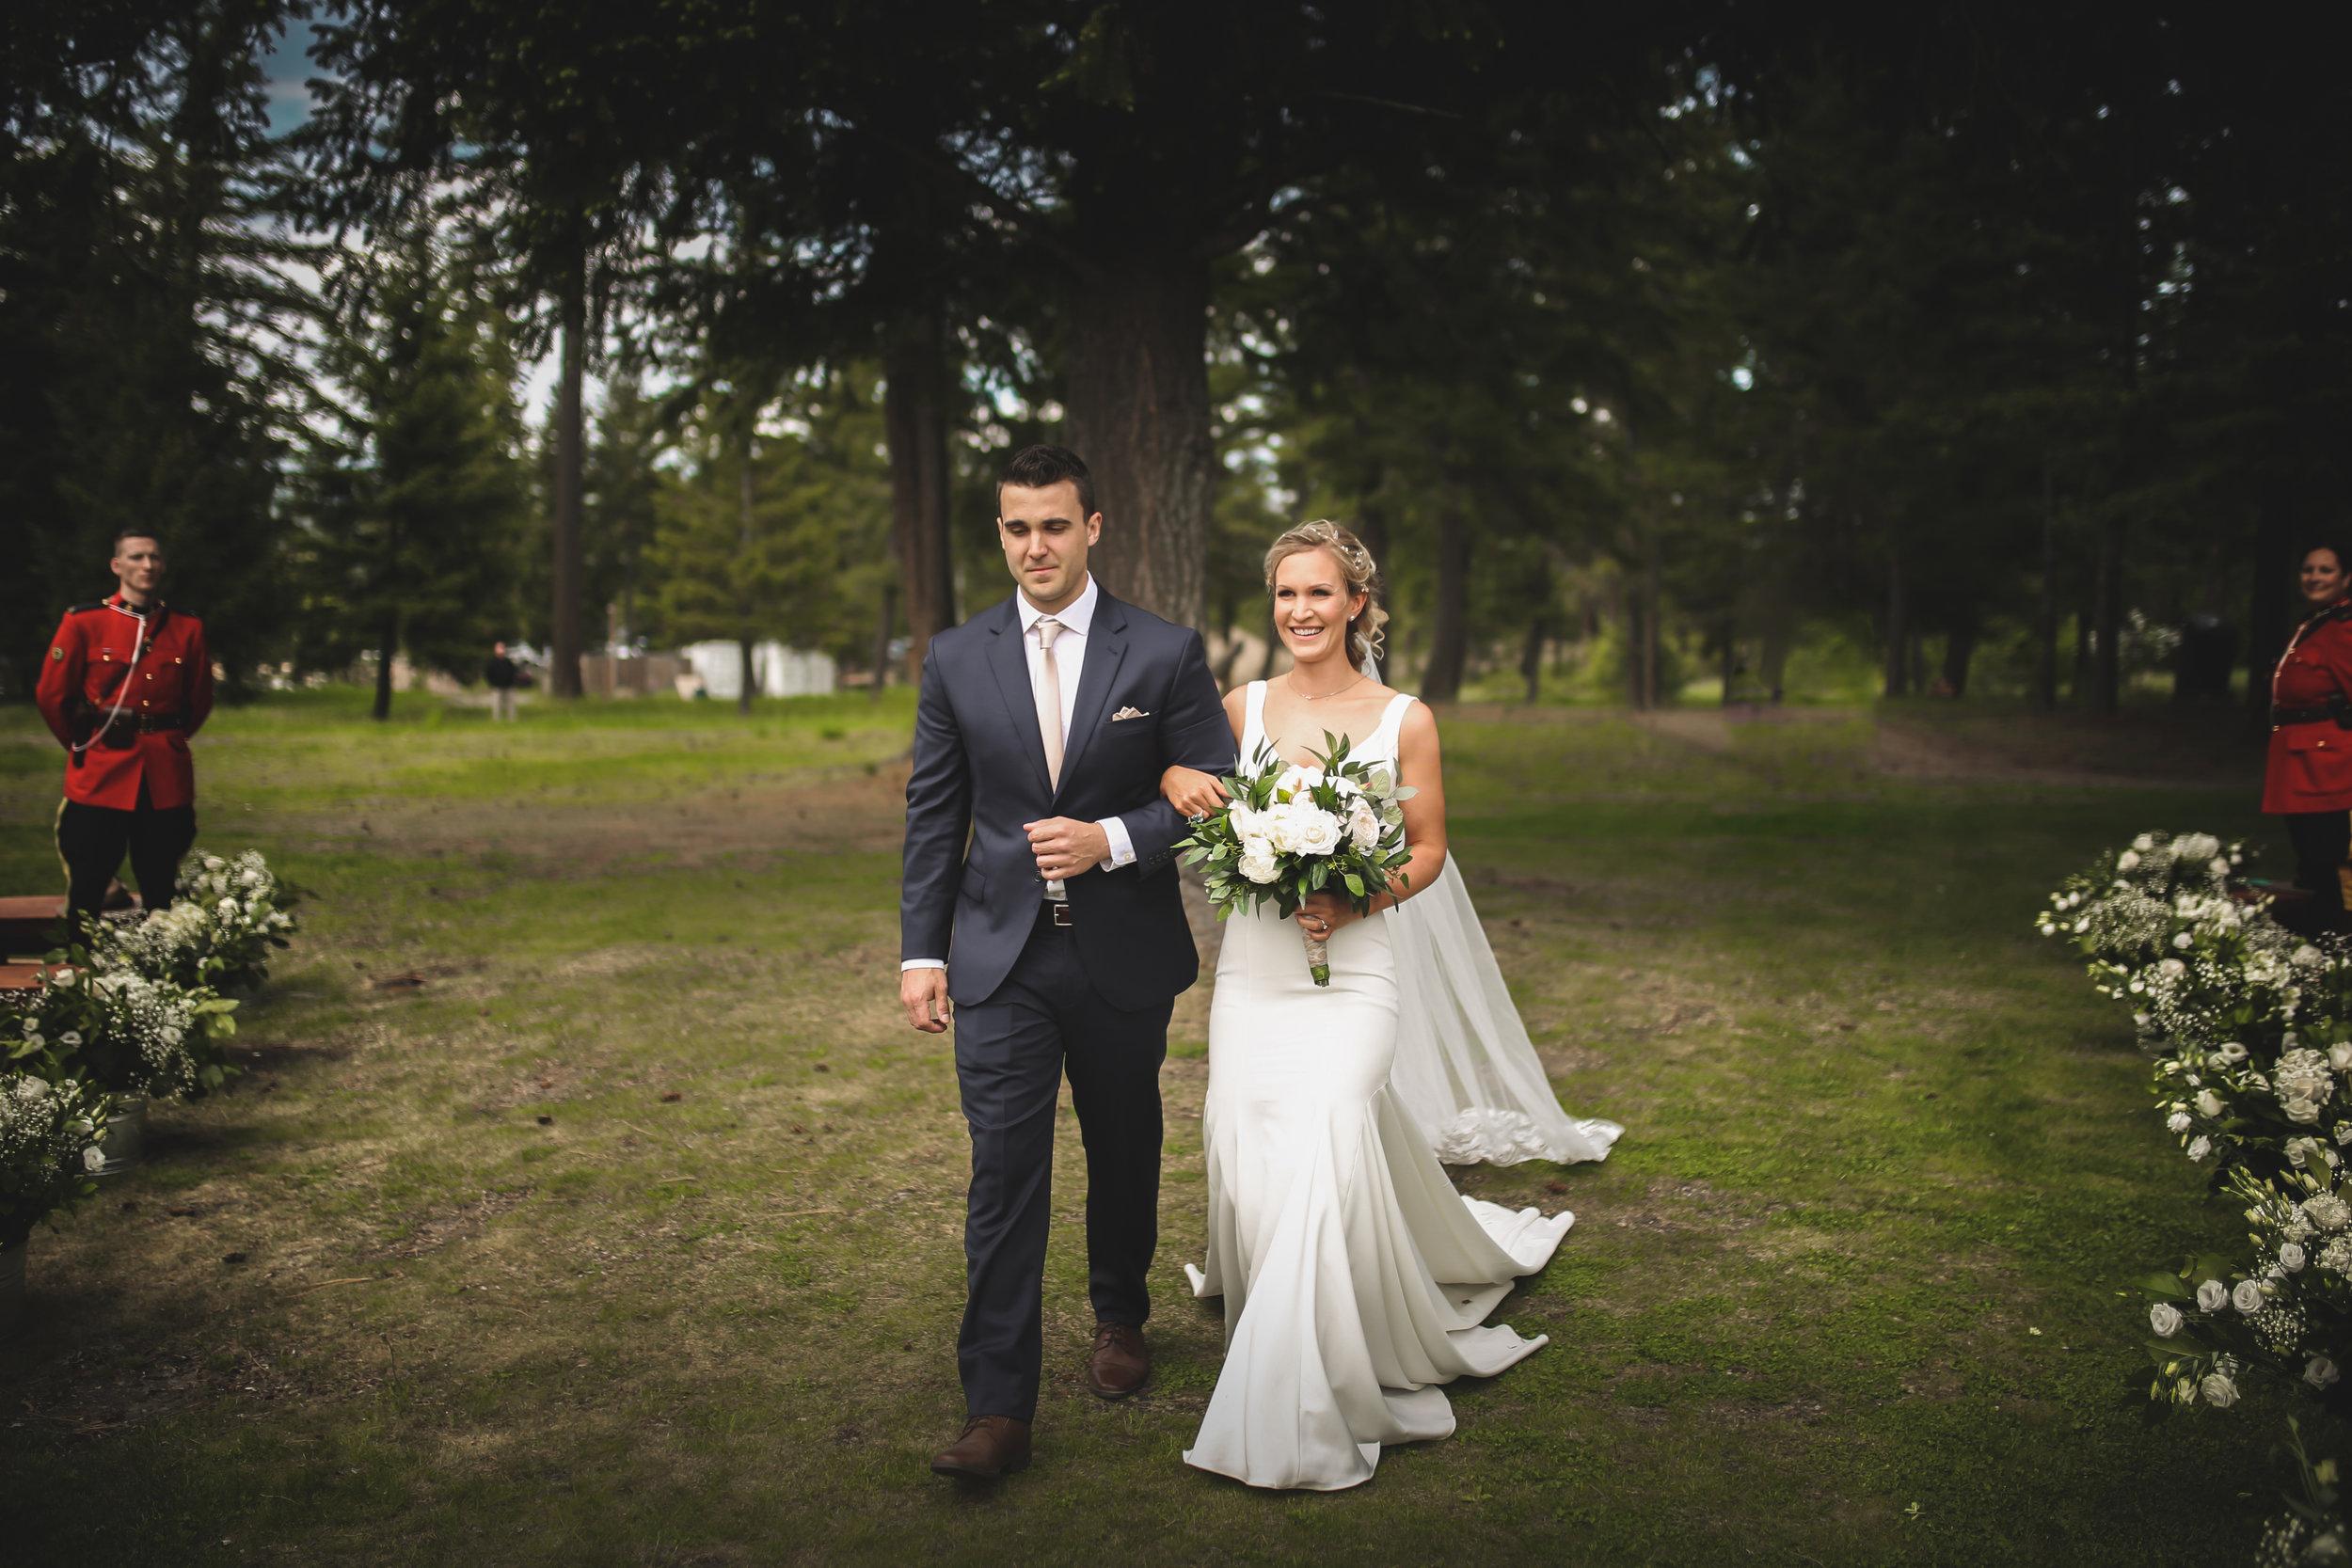 15 Adam Ziorio Photography - Kate & Ben's Wedding.jpg